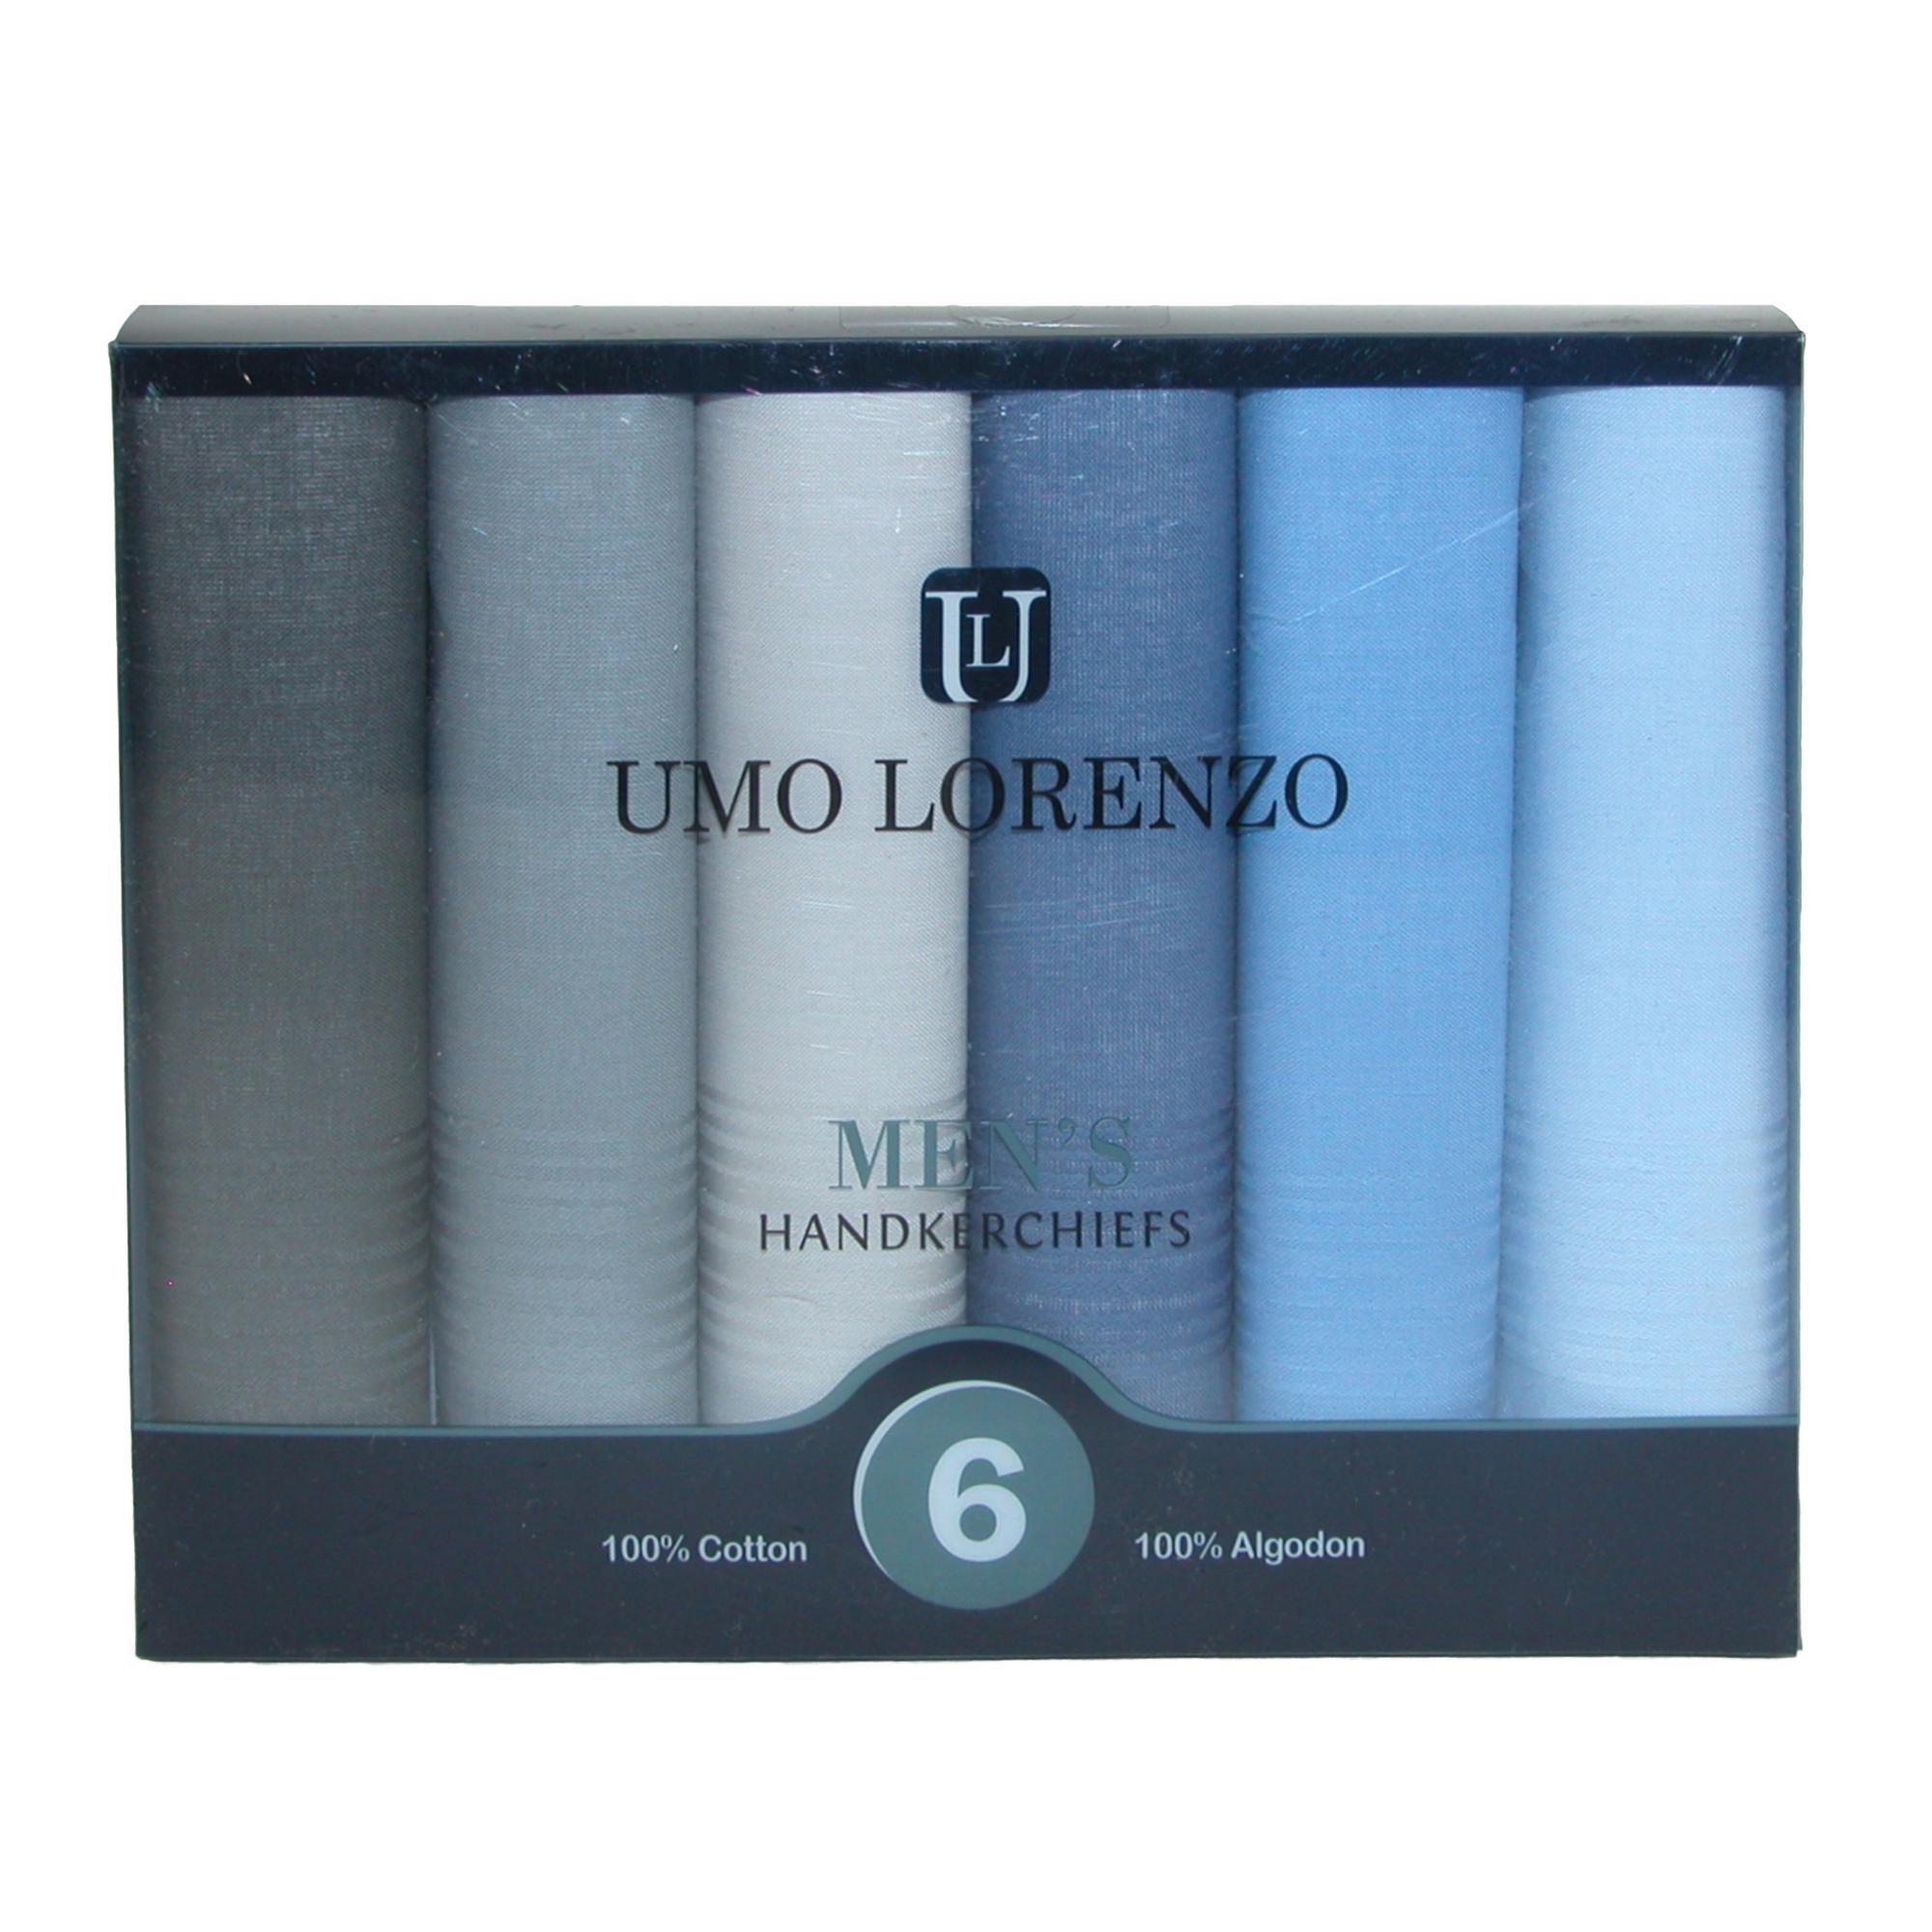 Umo Lorenzo Men's Cotton Multi-Color Dress Handkerchief Set (Pack of 6) by Umo Lorenzo (Image #2)